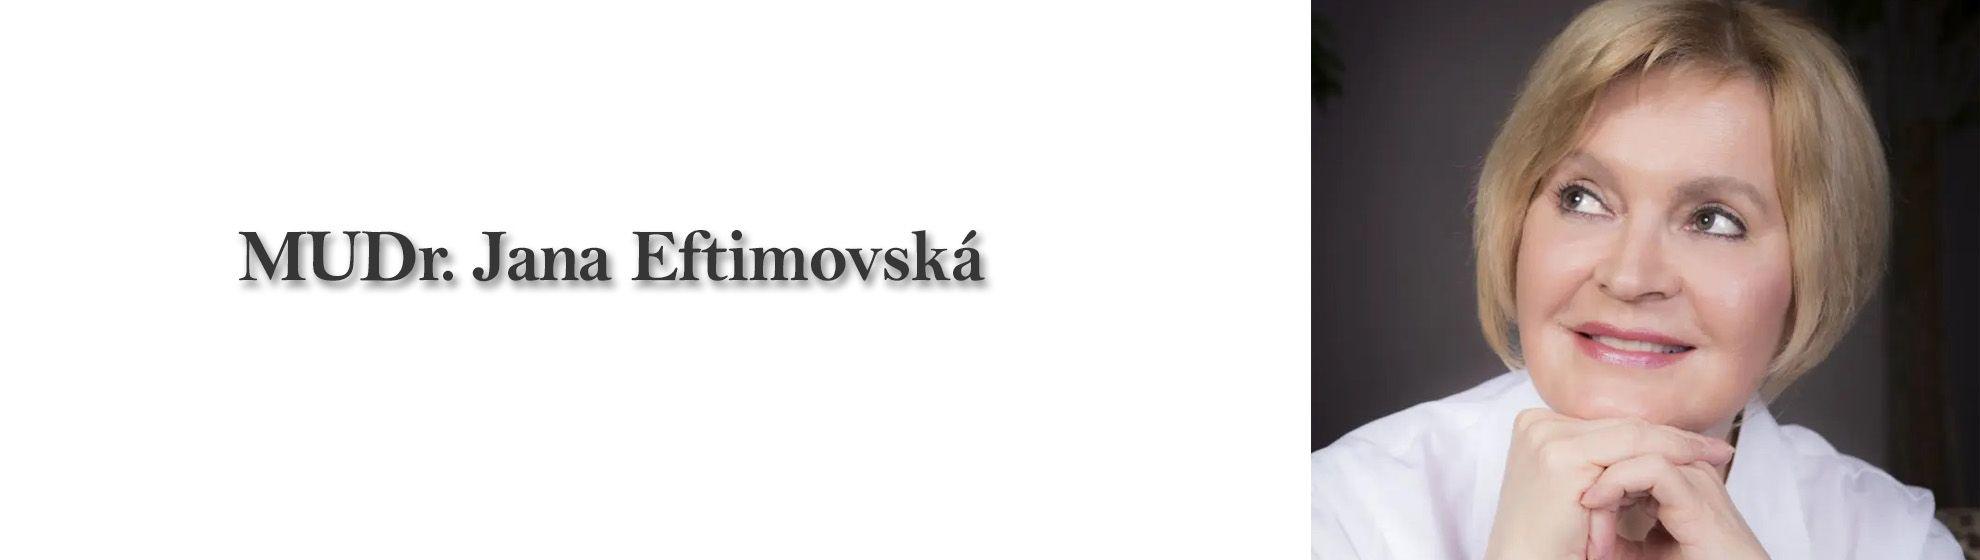 MUDr. Jana Eftimovská